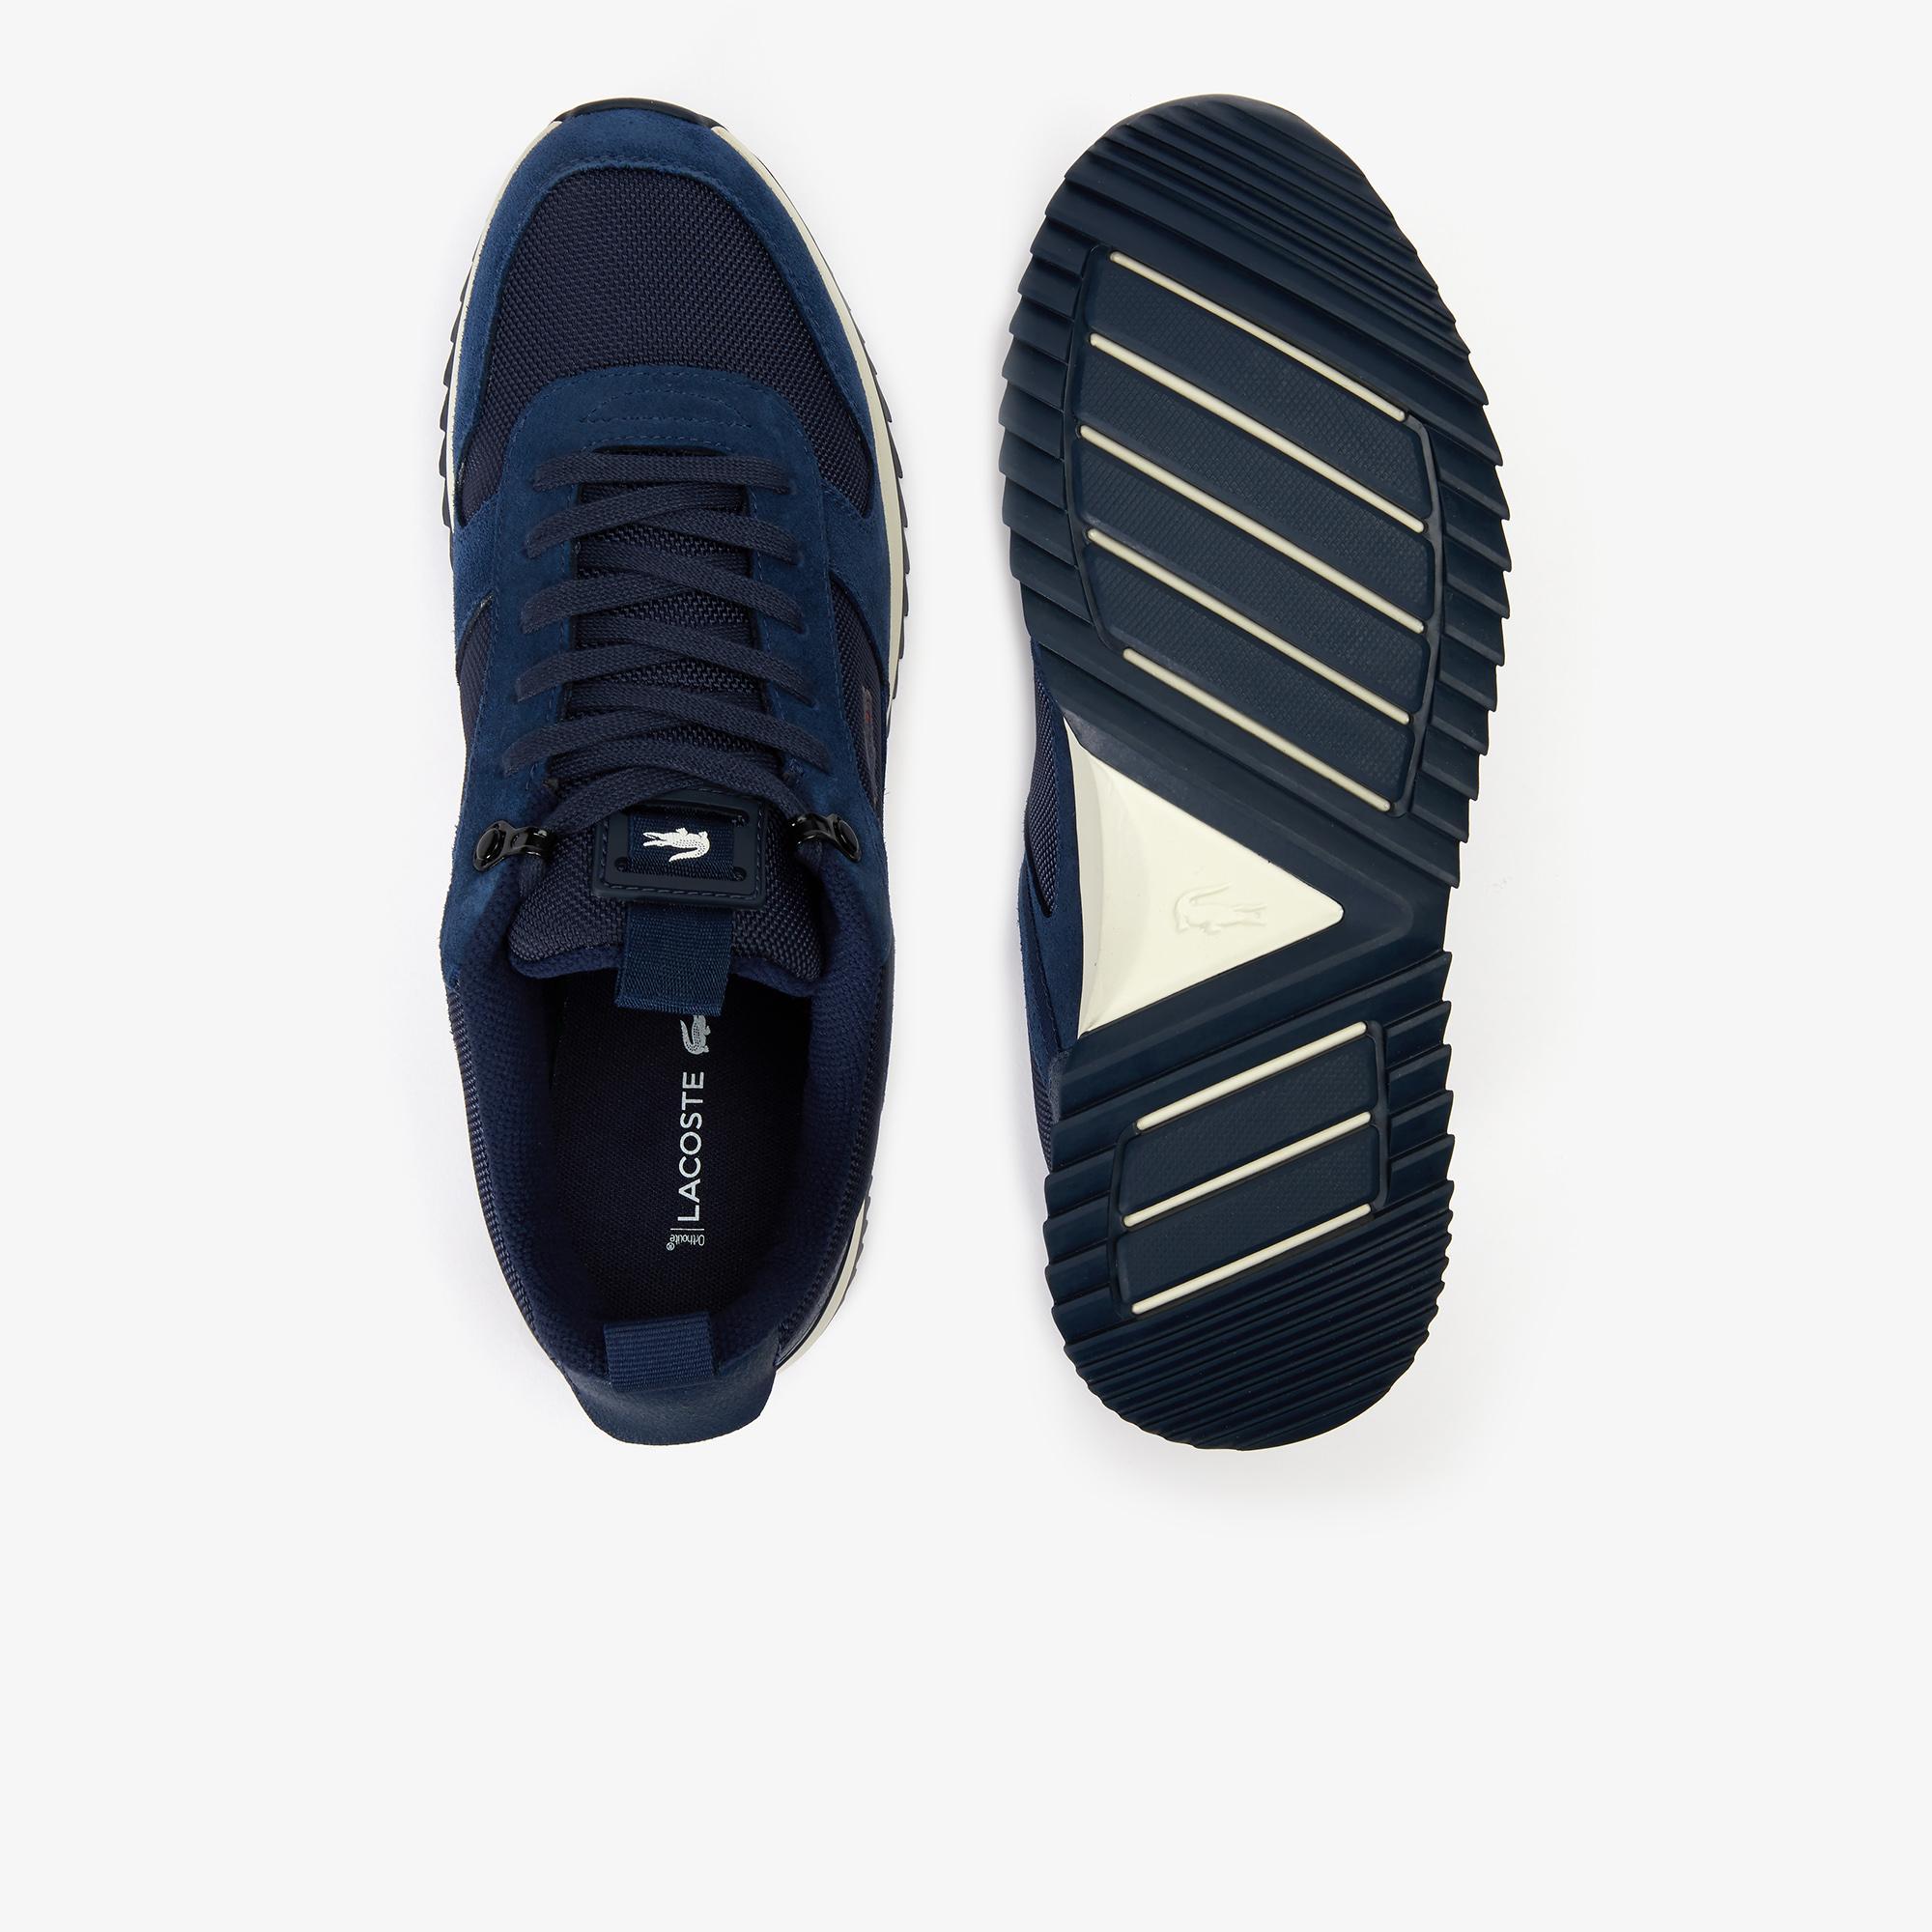 Lacoste Joggeur 2.0 319 1 Sma Męskie Sneakersy